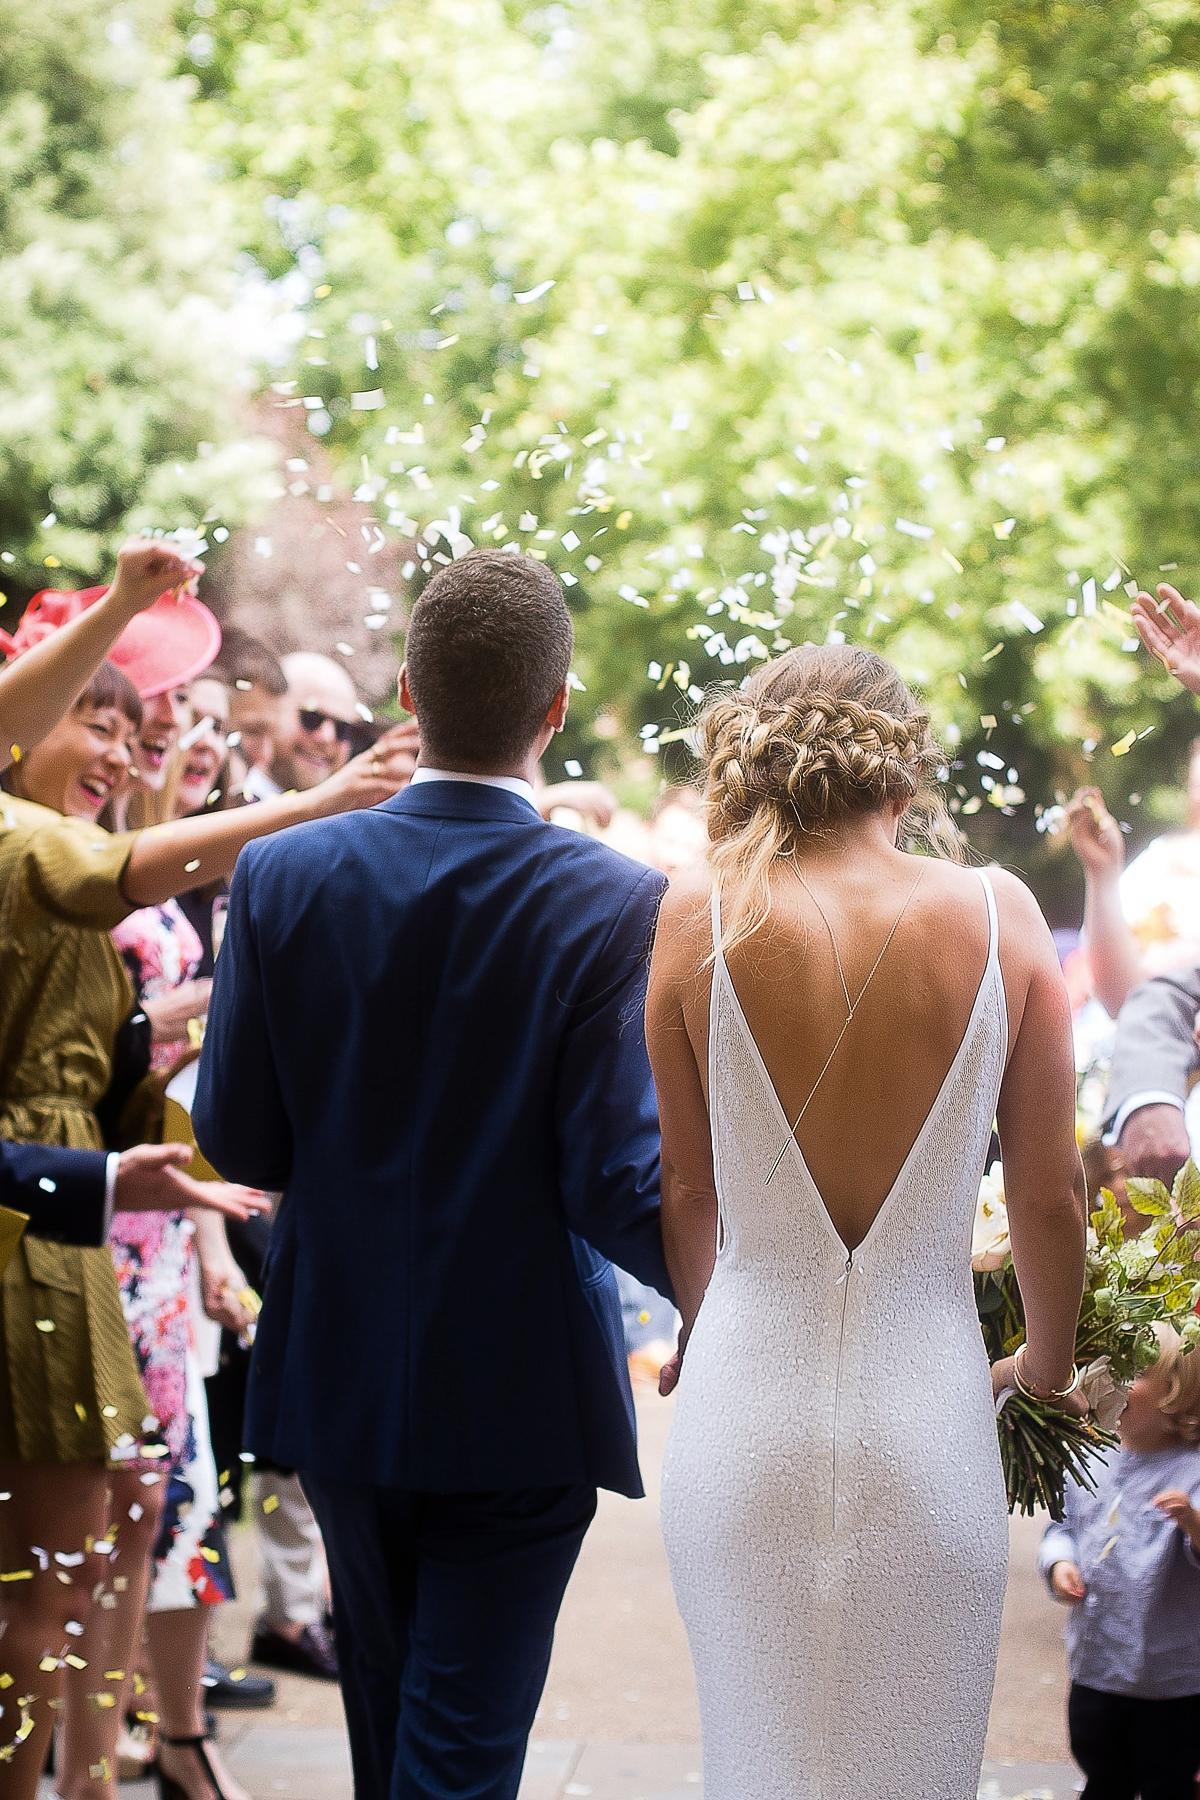 And-For-Love-wedding-dress-20.jpg